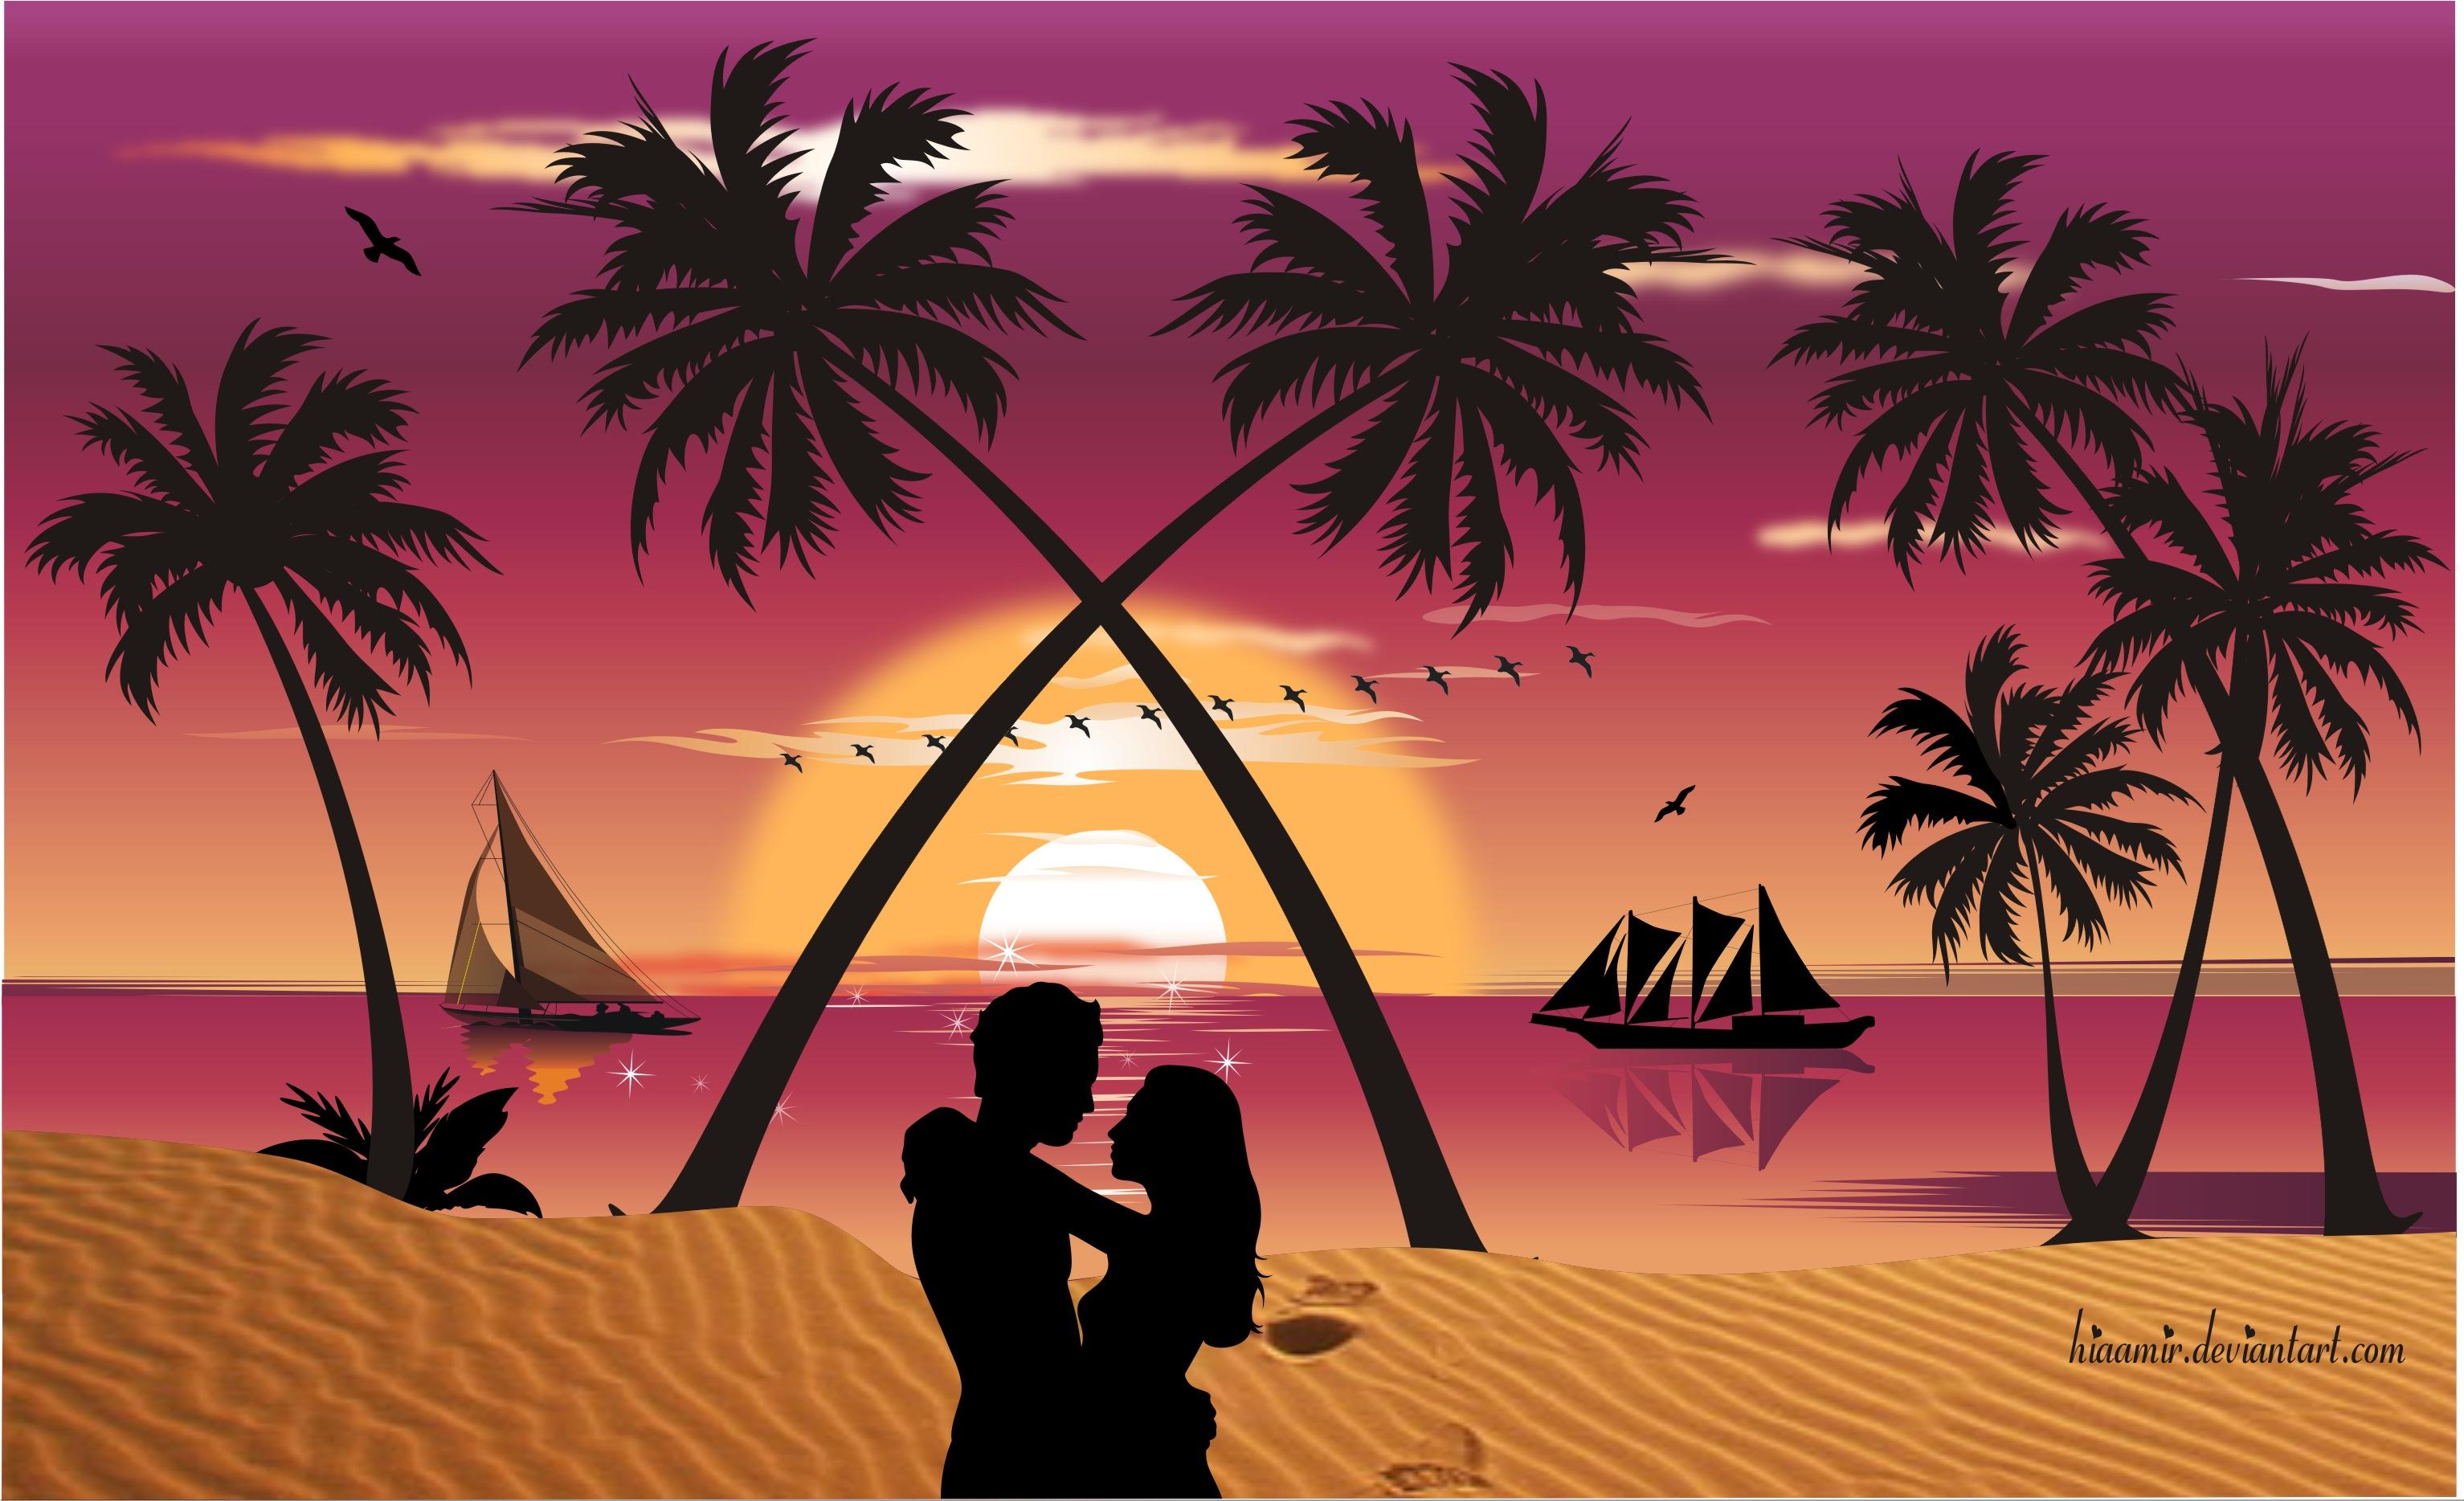 Romantic Sunset by hiaamir